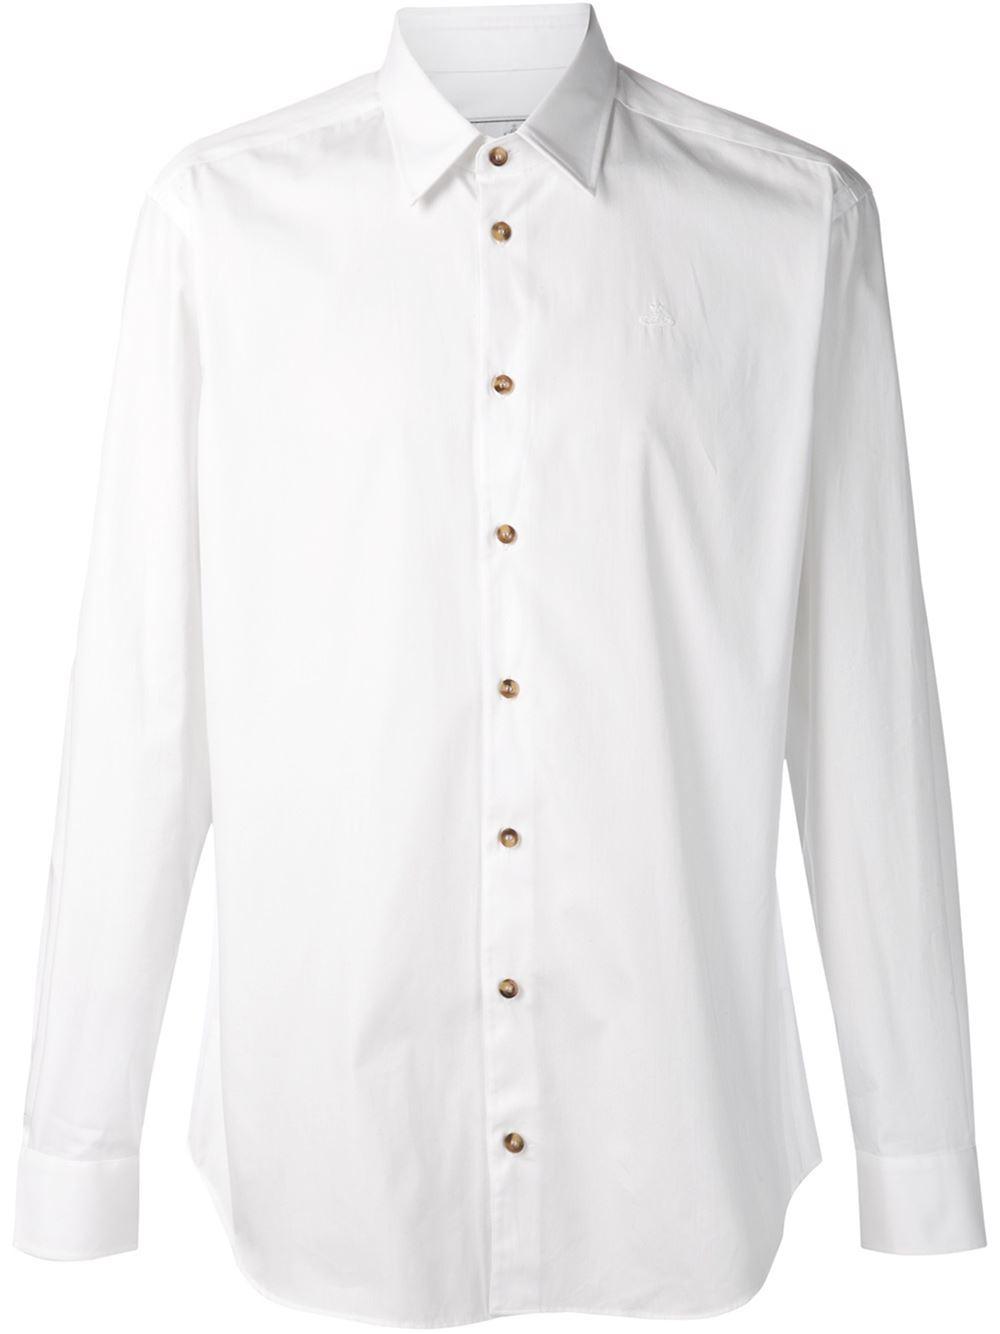 Vivienne westwood cutaway collar shirt in white for men lyst for White cutaway collar shirt